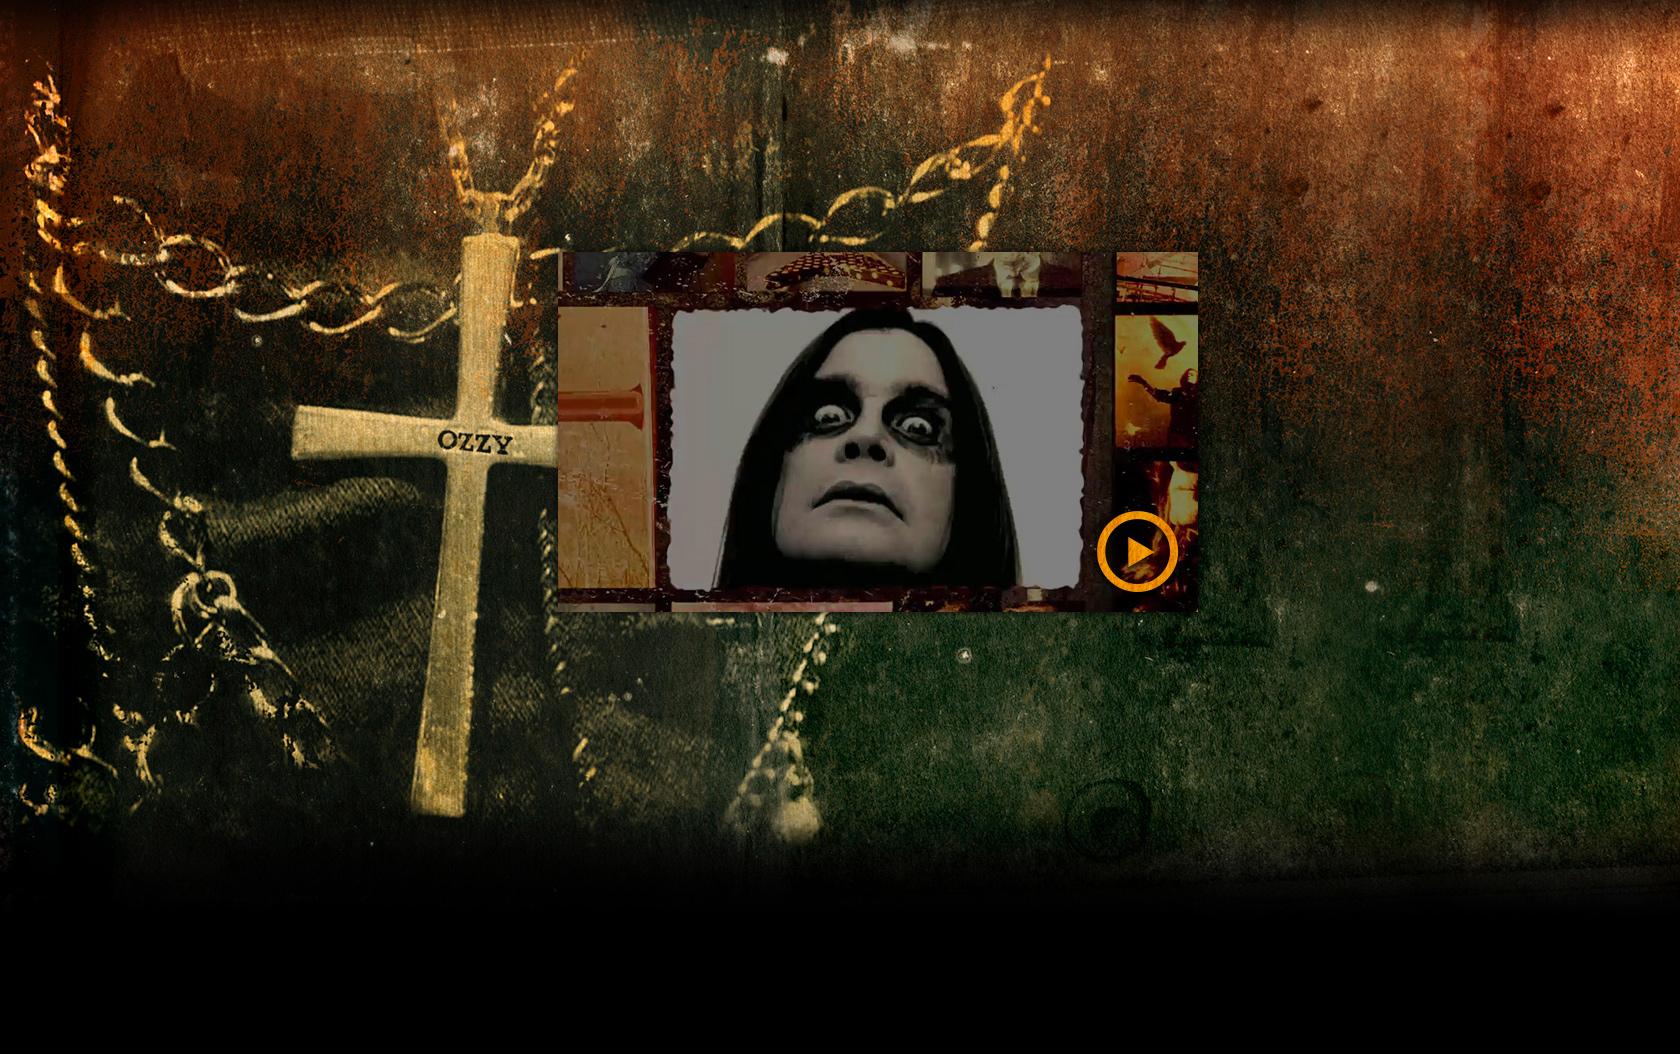 Ozzy Osbourne The Official Ozzy Osbourne Site